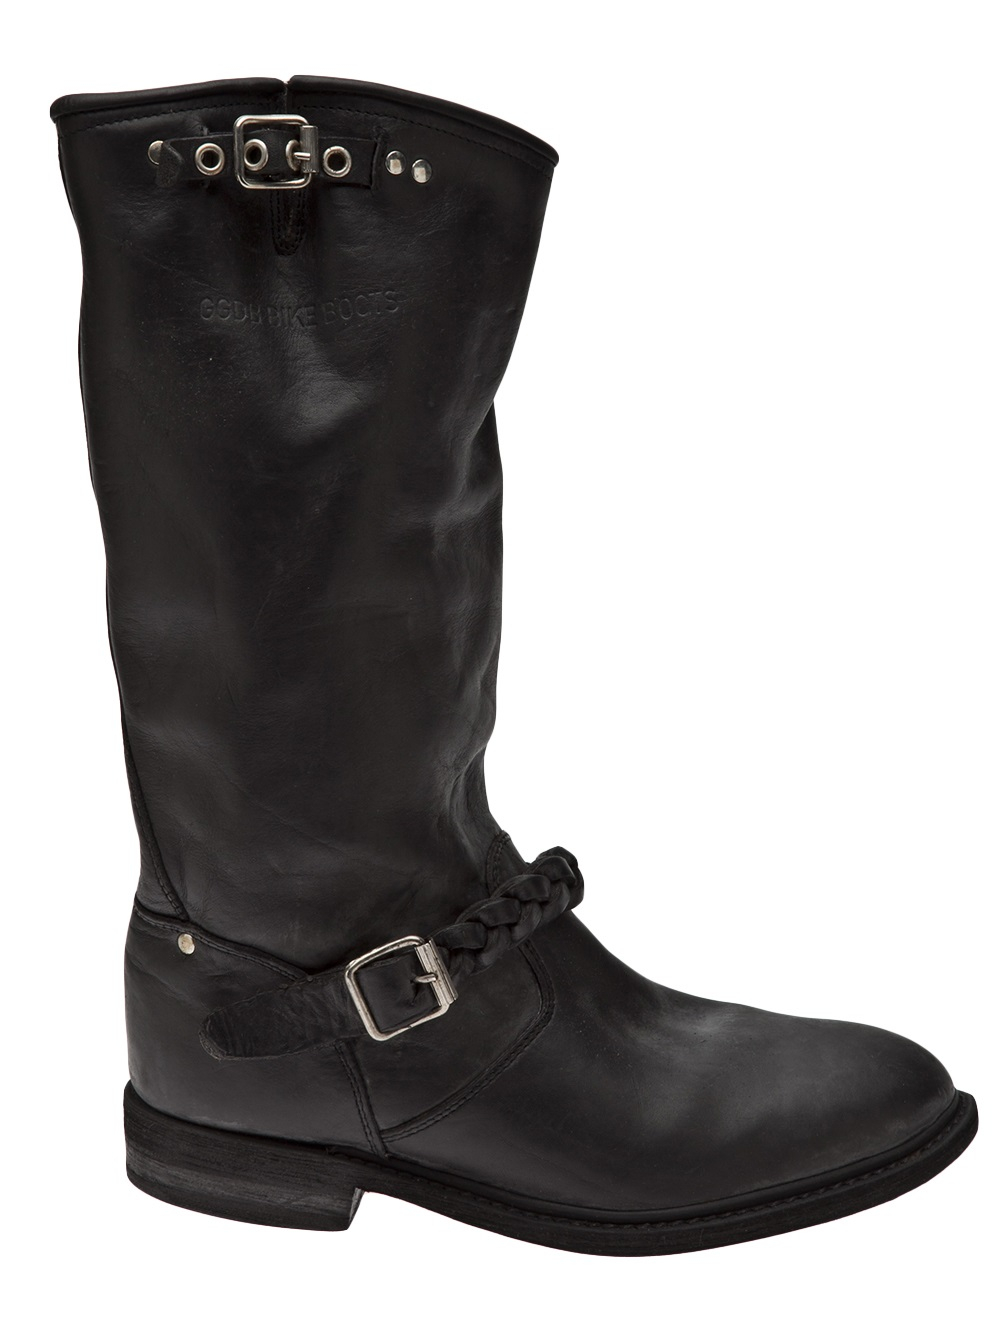 golden goose deluxe brand biker boots in black lyst. Black Bedroom Furniture Sets. Home Design Ideas